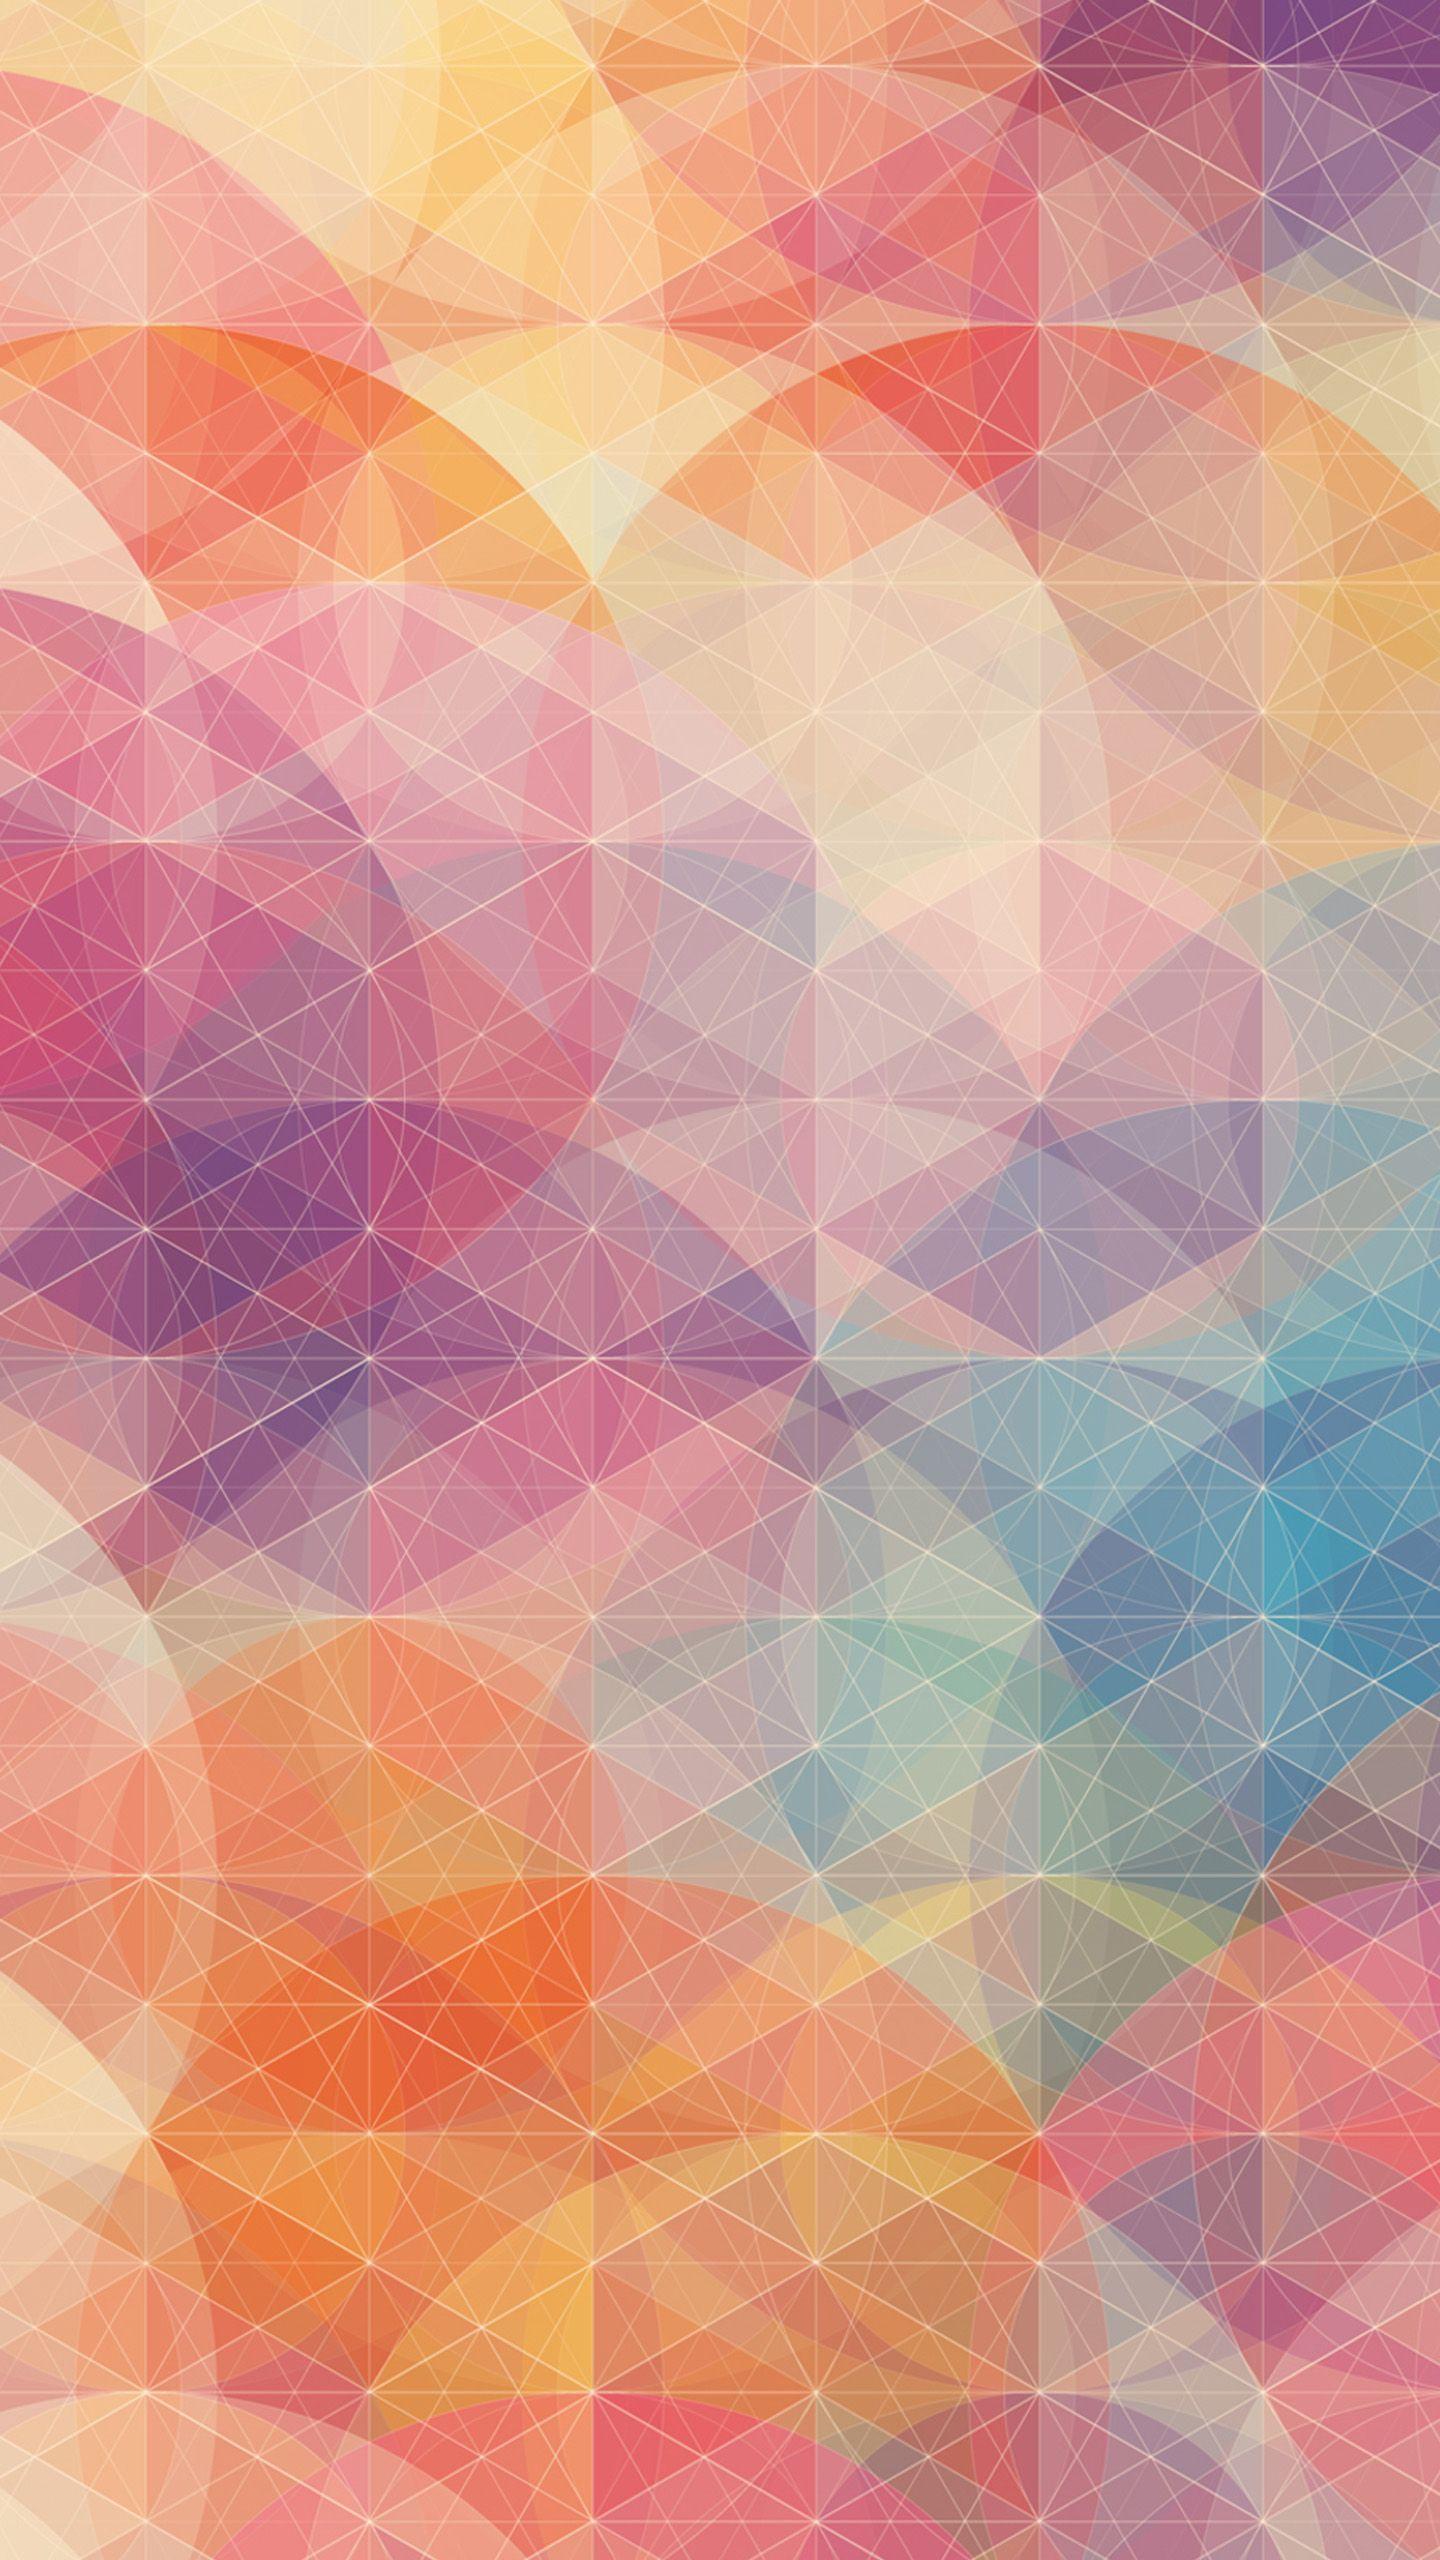 Colorful lg g3 wallpapers phone stuff retina wallpaper - Lg g3 christmas wallpaper ...